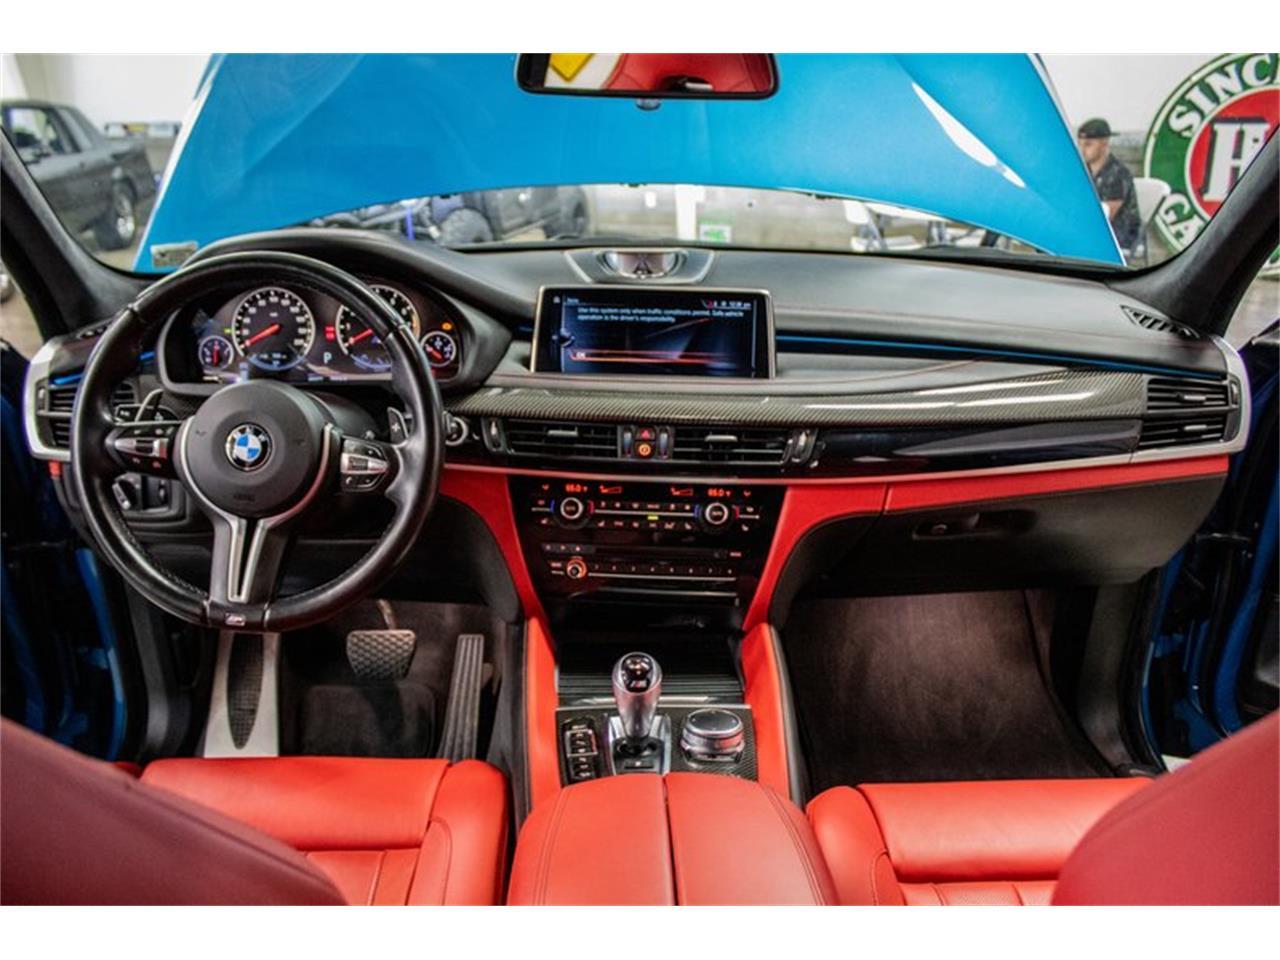 Large Picture of 2017 BMW X5 located in Michigan - $61,990.00 - QAOC